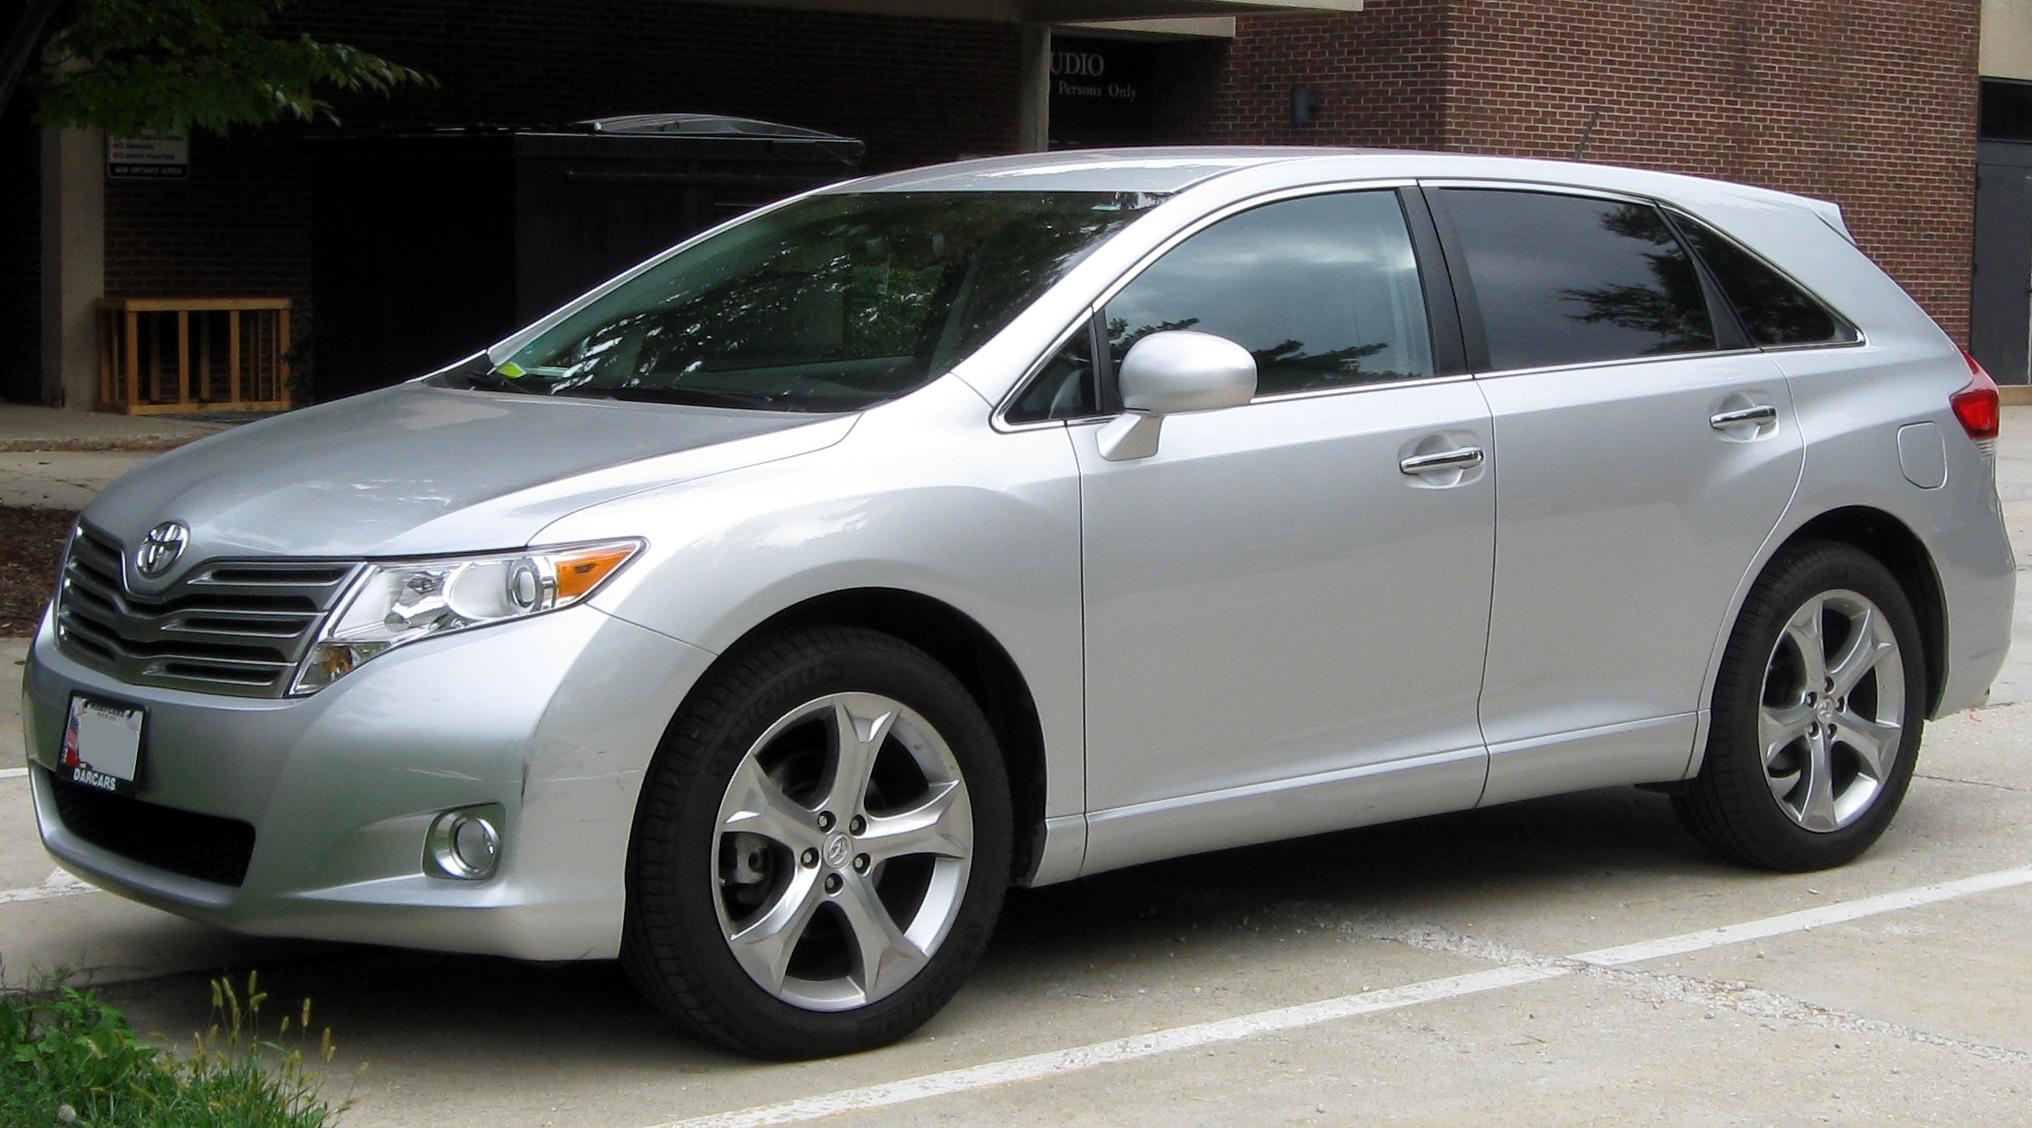 2010 Toyota Venza Partsopen